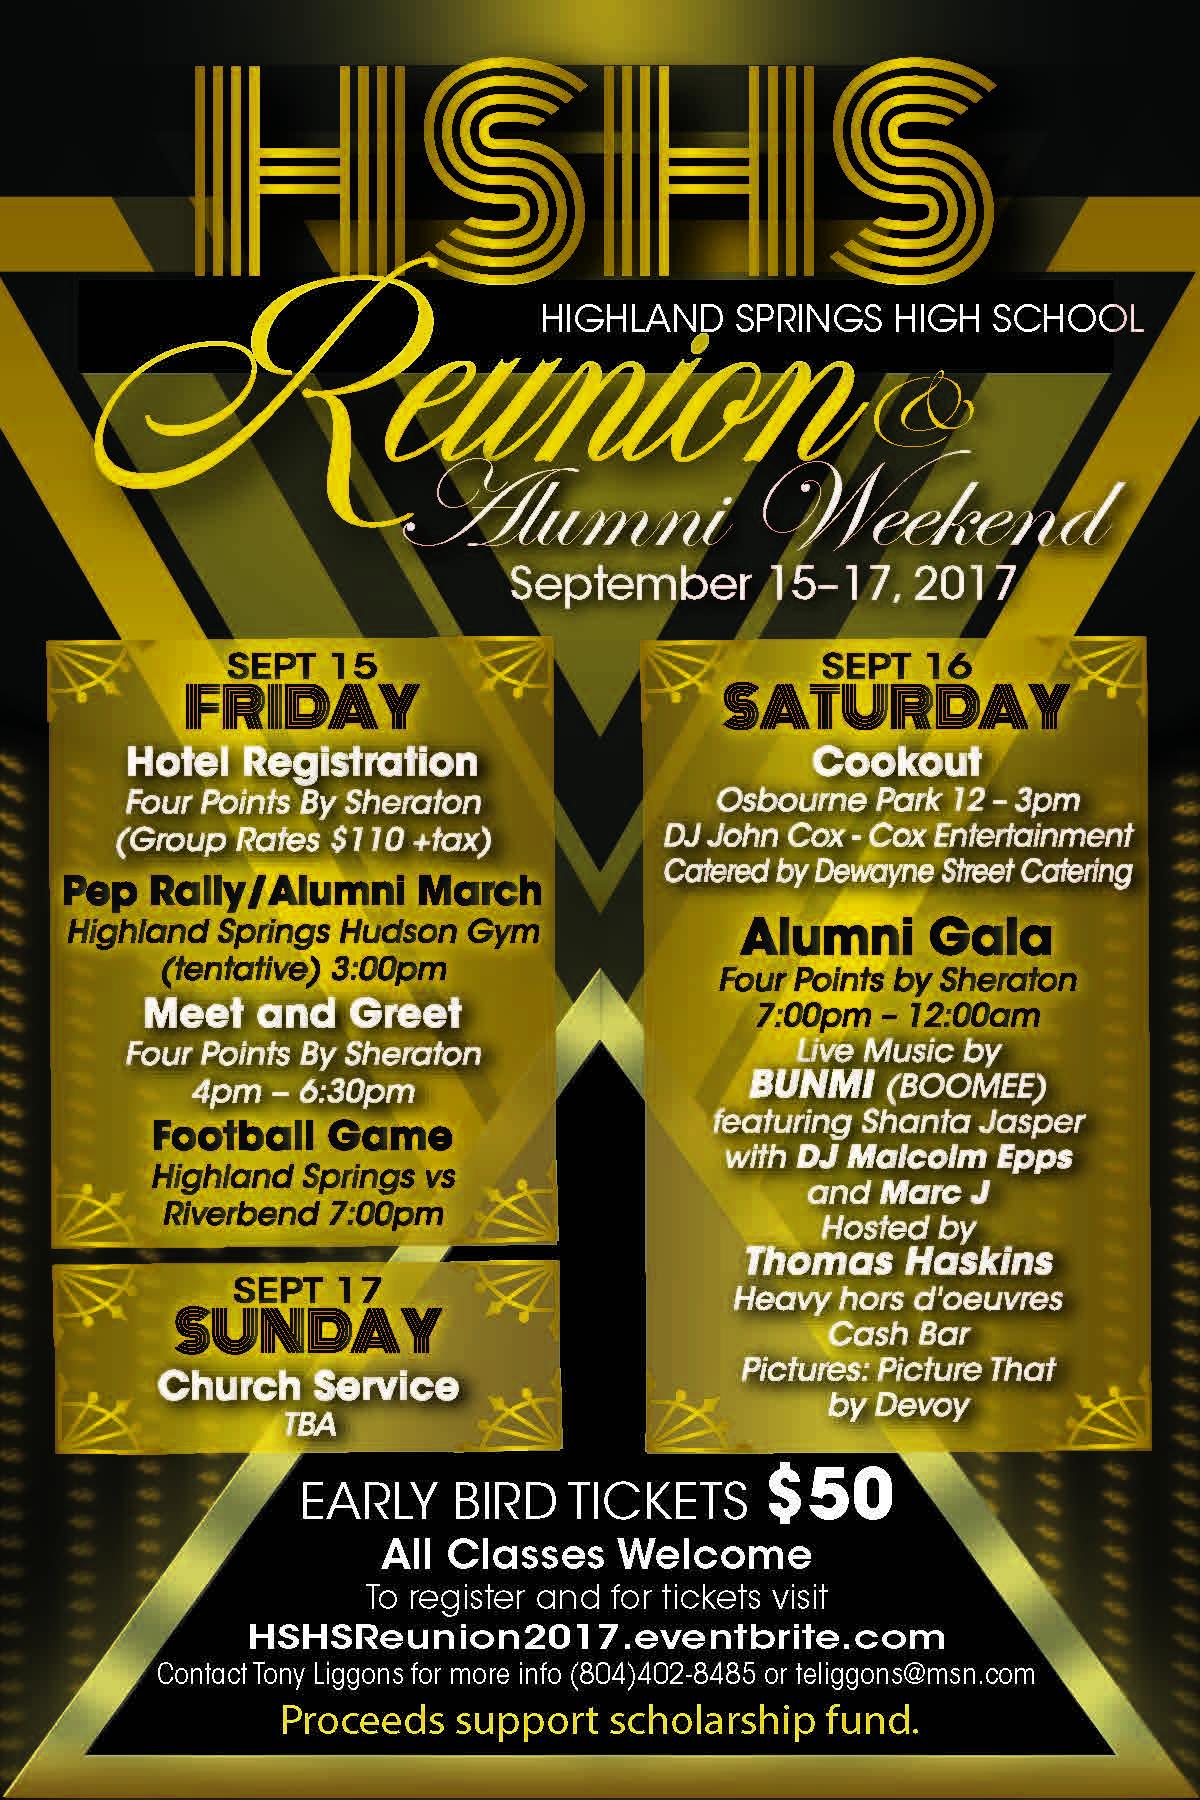 Highland Springs High School Reunion & Alumni Weekend Details